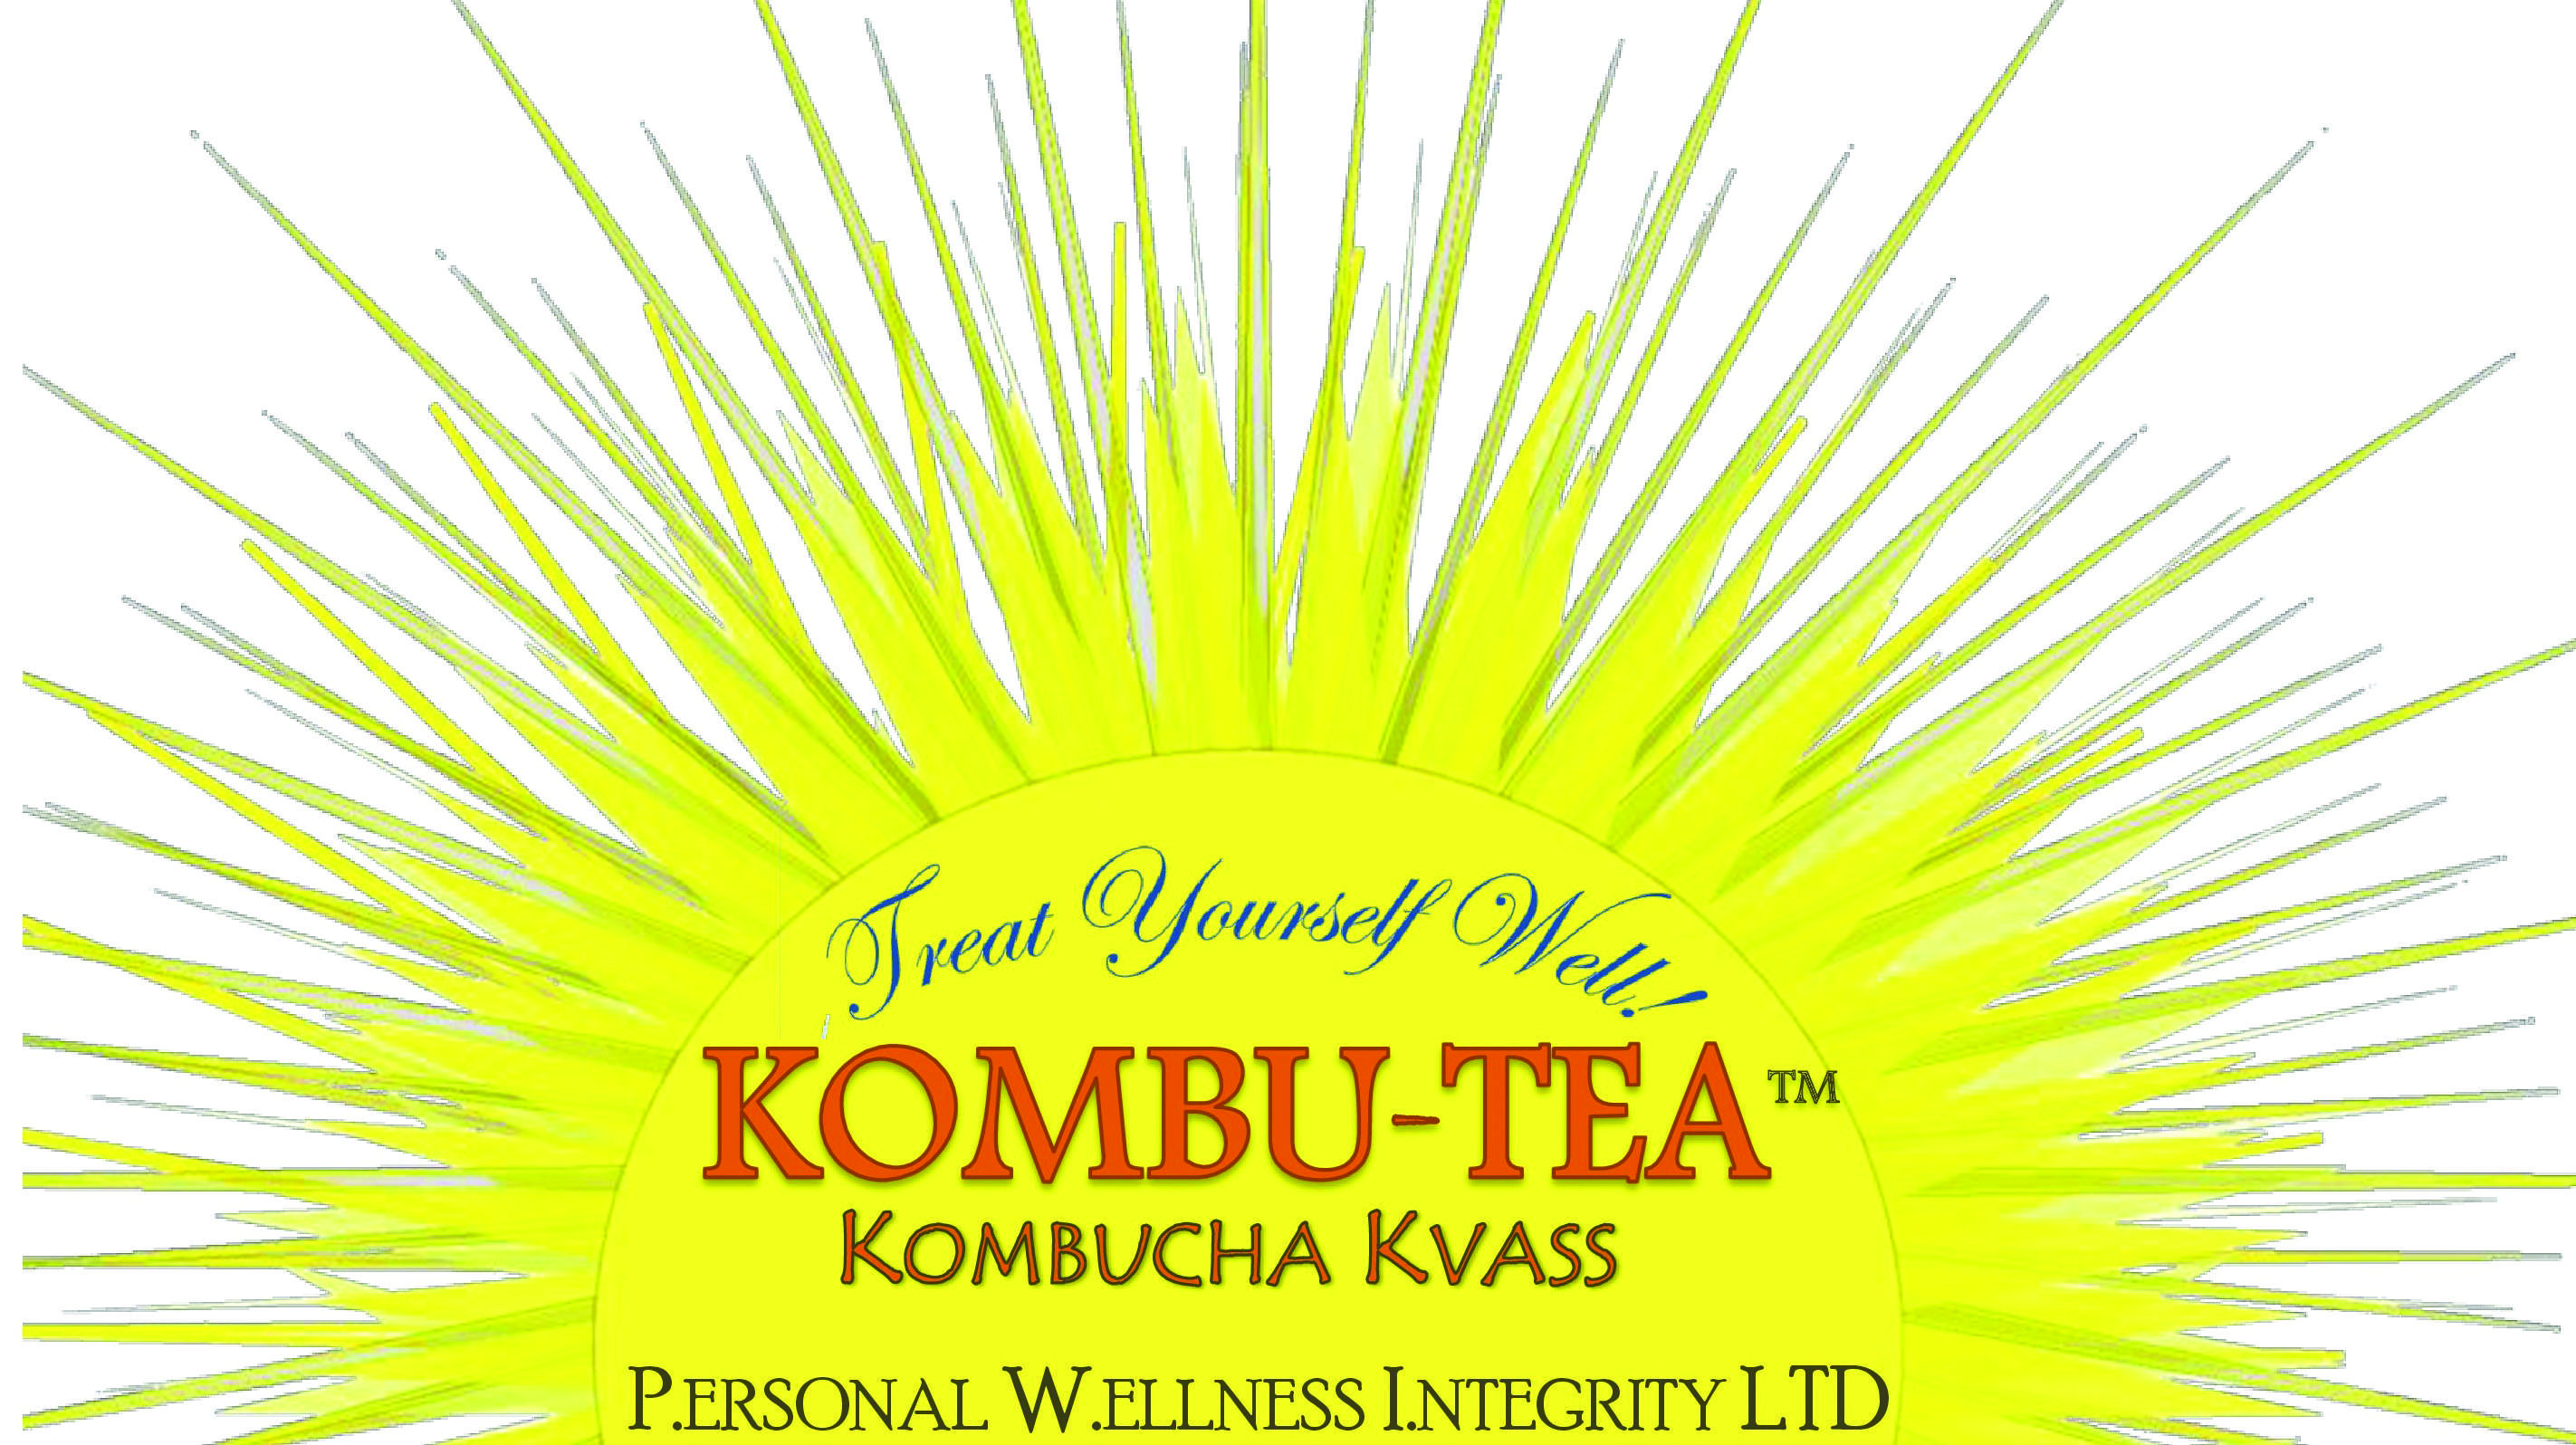 Kombu-Tea